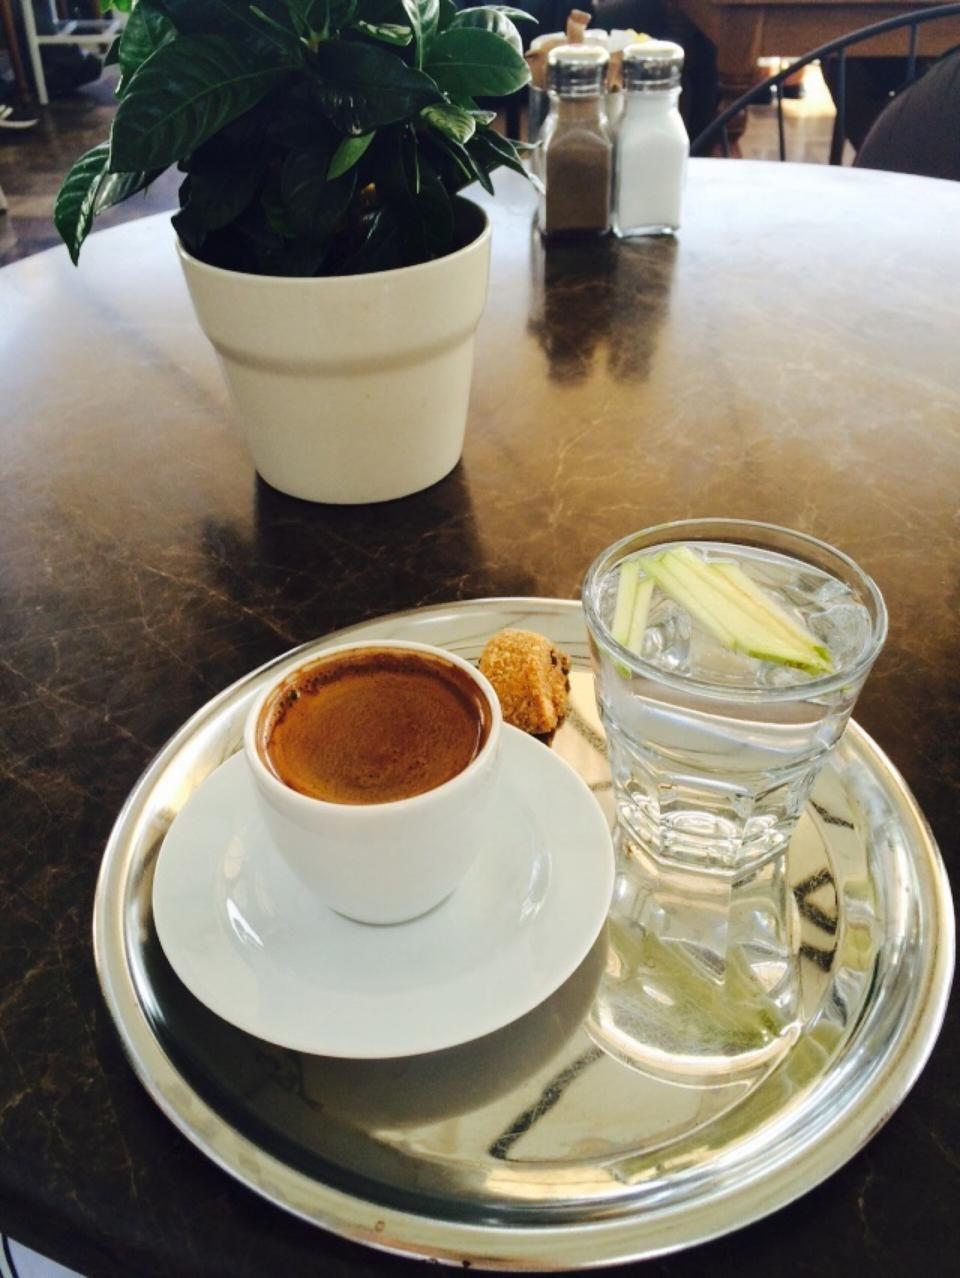 COFFEE TIME, COFFEE BREAK, TURKISH COFFEE, TÜRK KAHVESİ